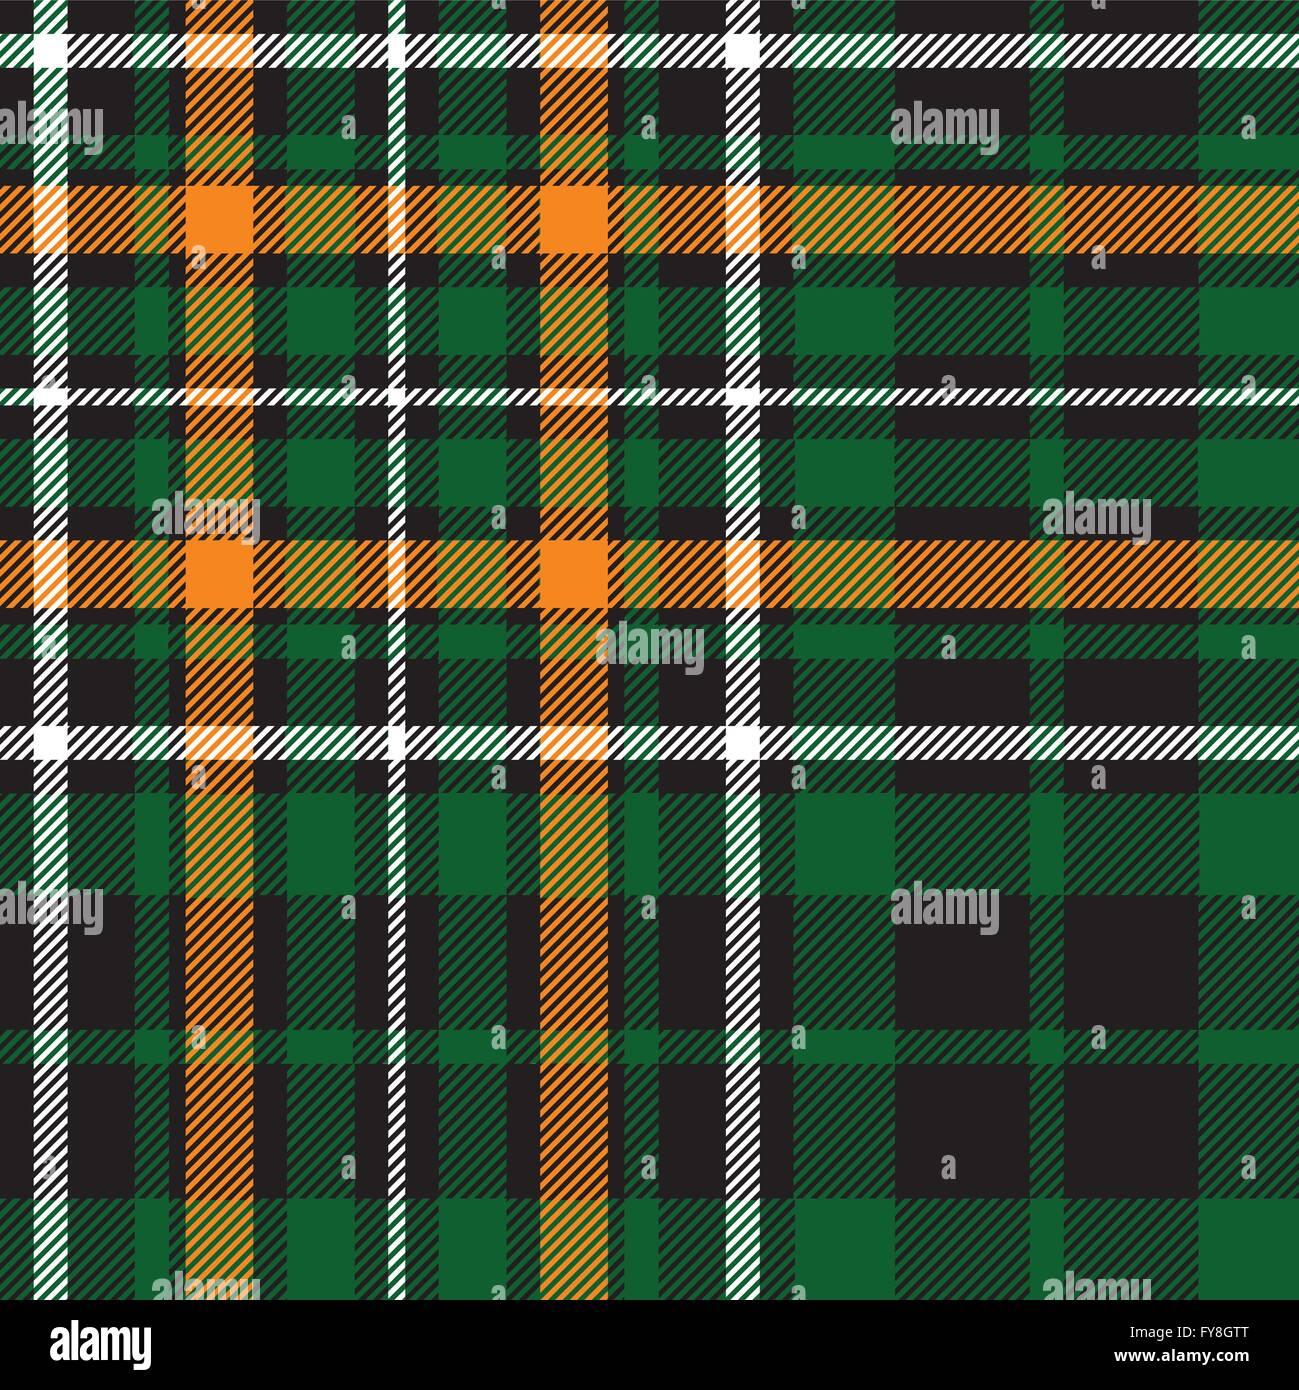 Green Tartan Celtic Fc Seamless Pattern Fabric Texture Vector Illustration EPS 10 No Transparency Gradients